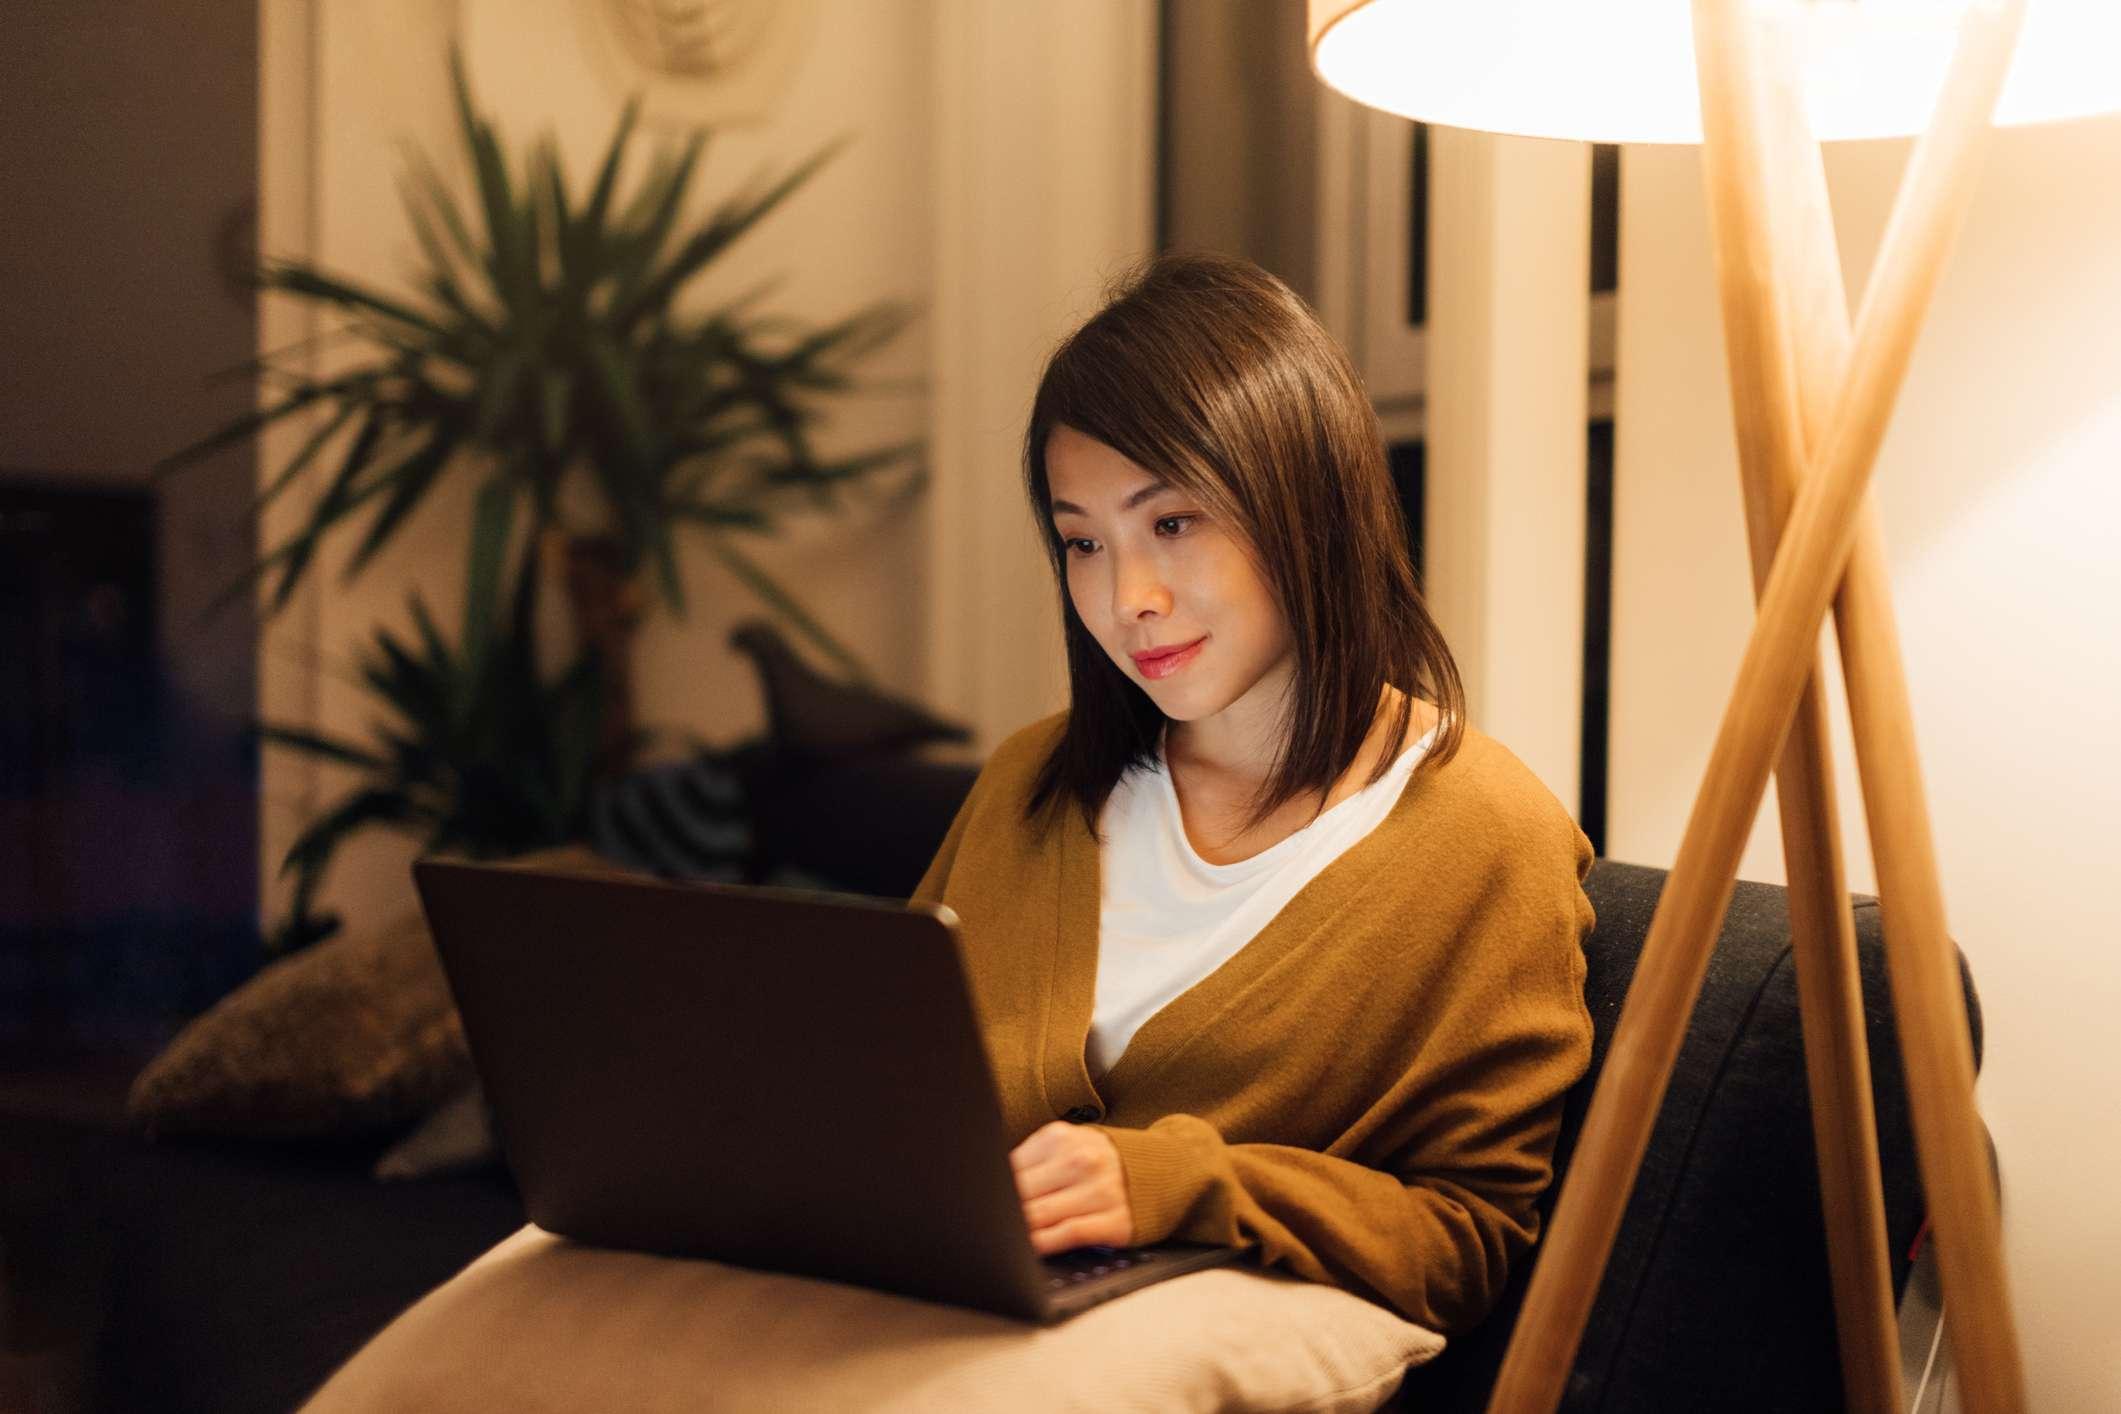 Woman focused on laptop screen